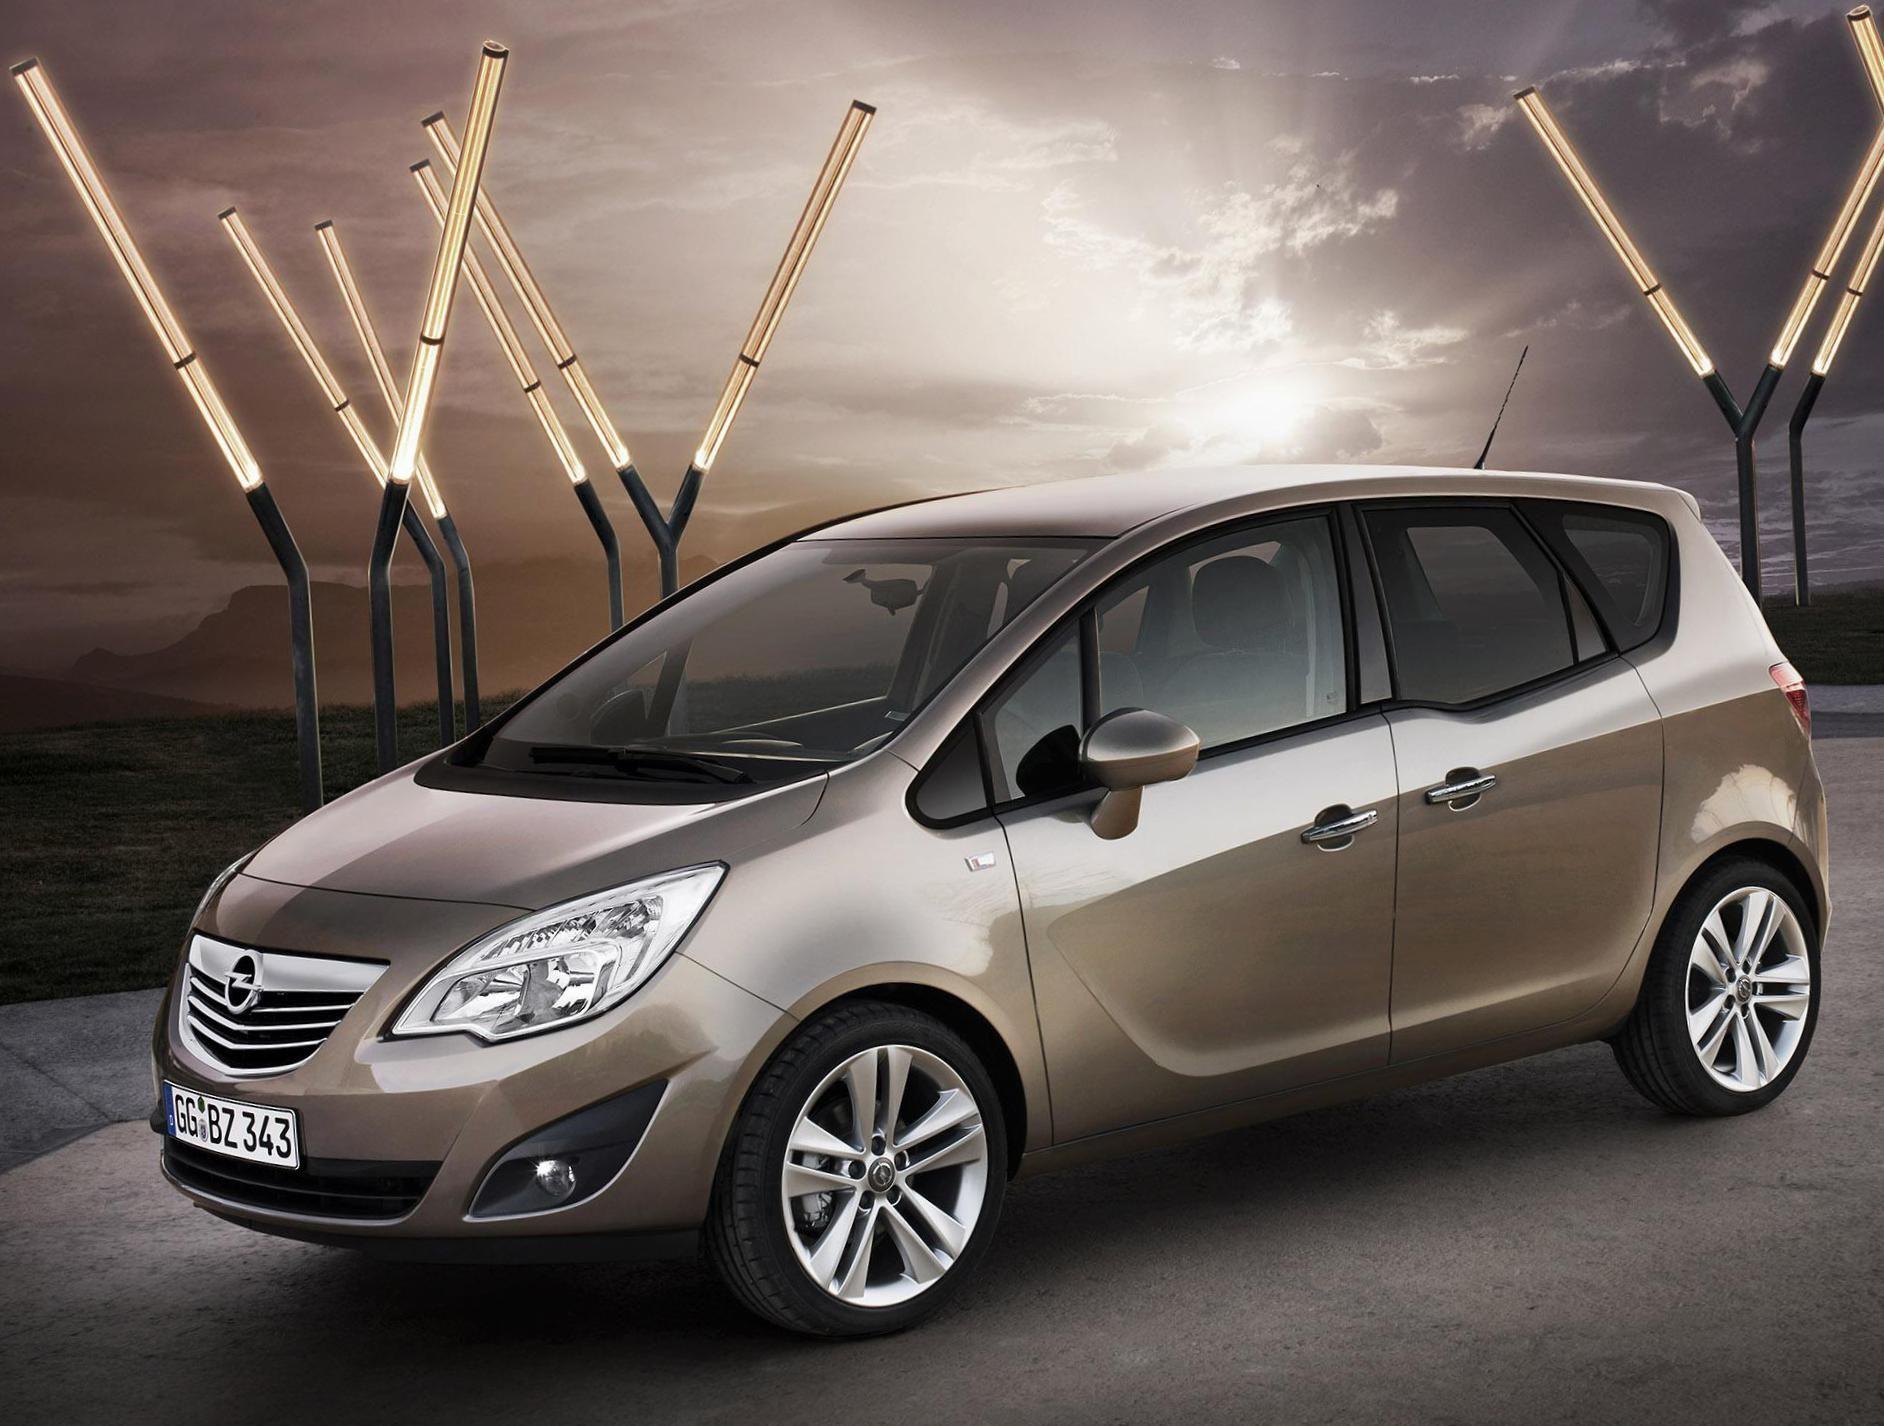 Opel Meriva B Sale Http Autotras Com